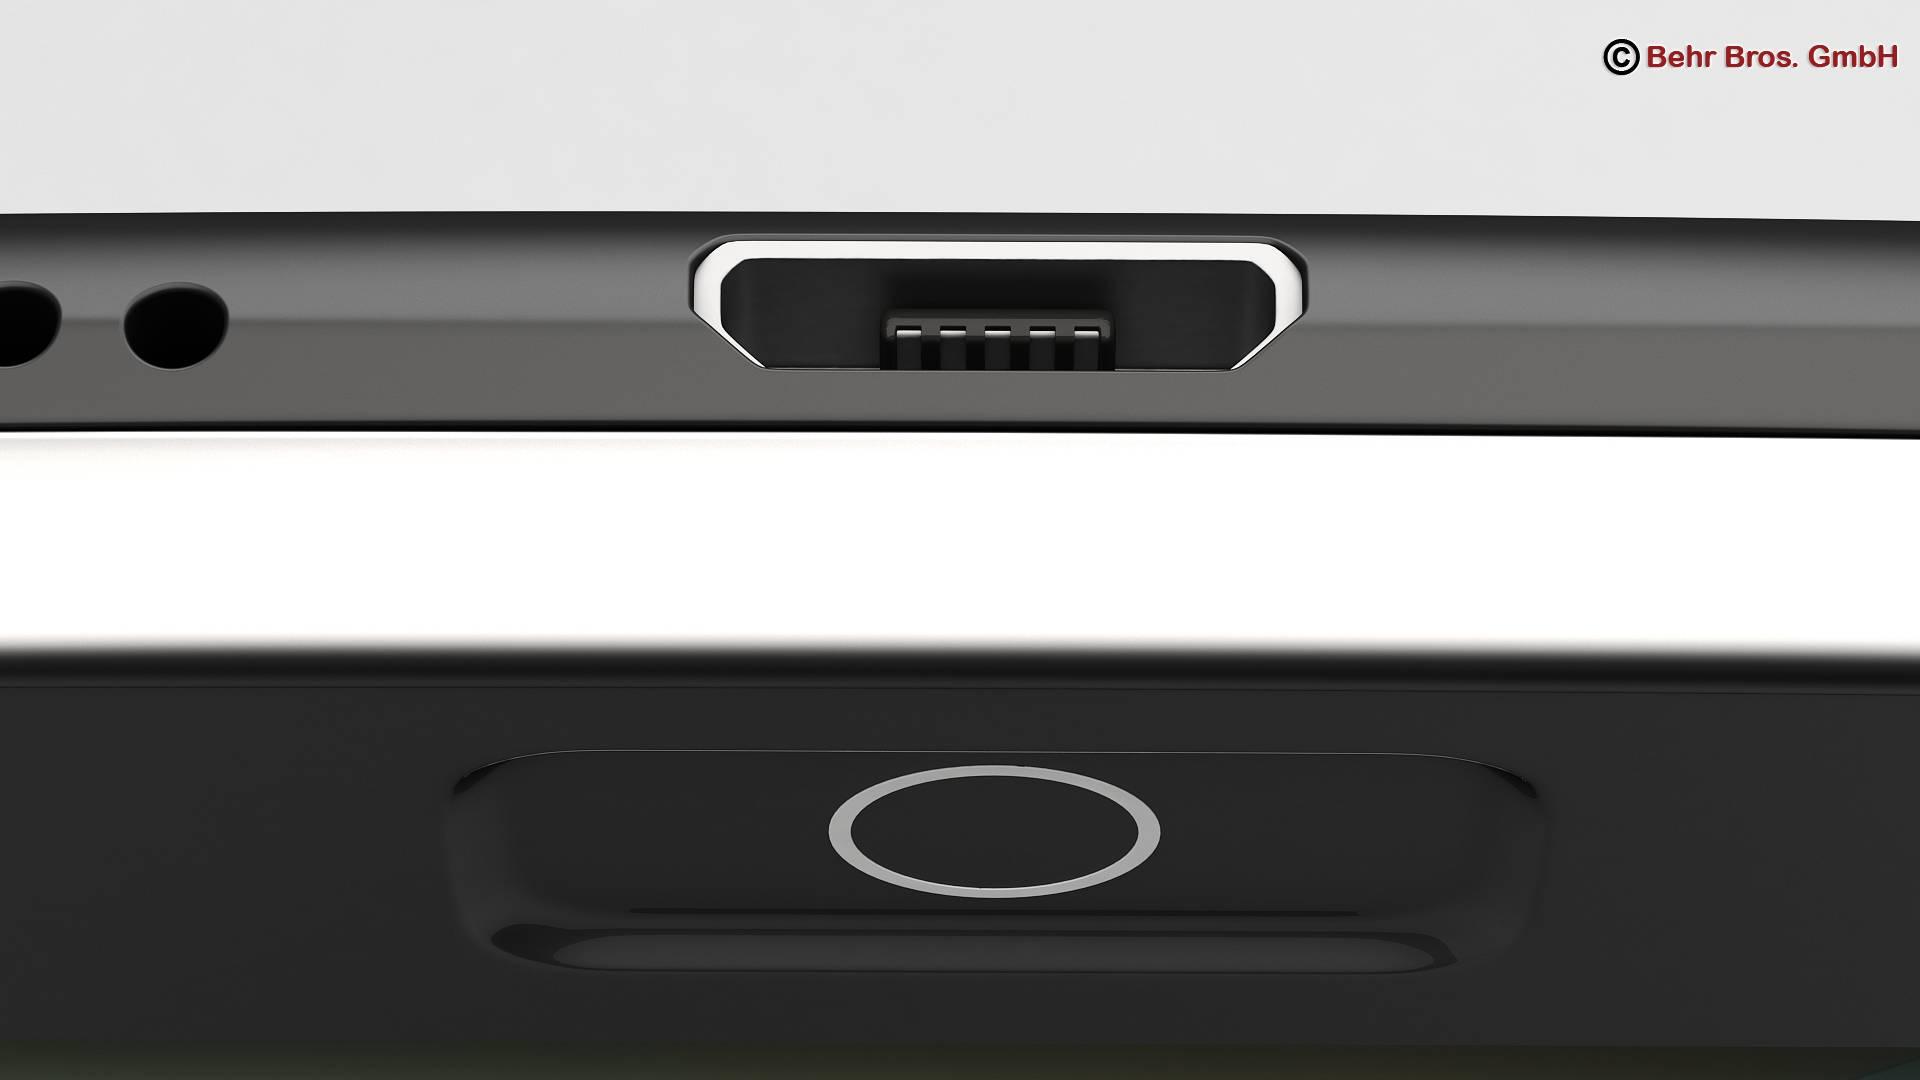 generic smartphone 6 inch 3d model 3ds max fbx c4d lwo ma mb obj 161665